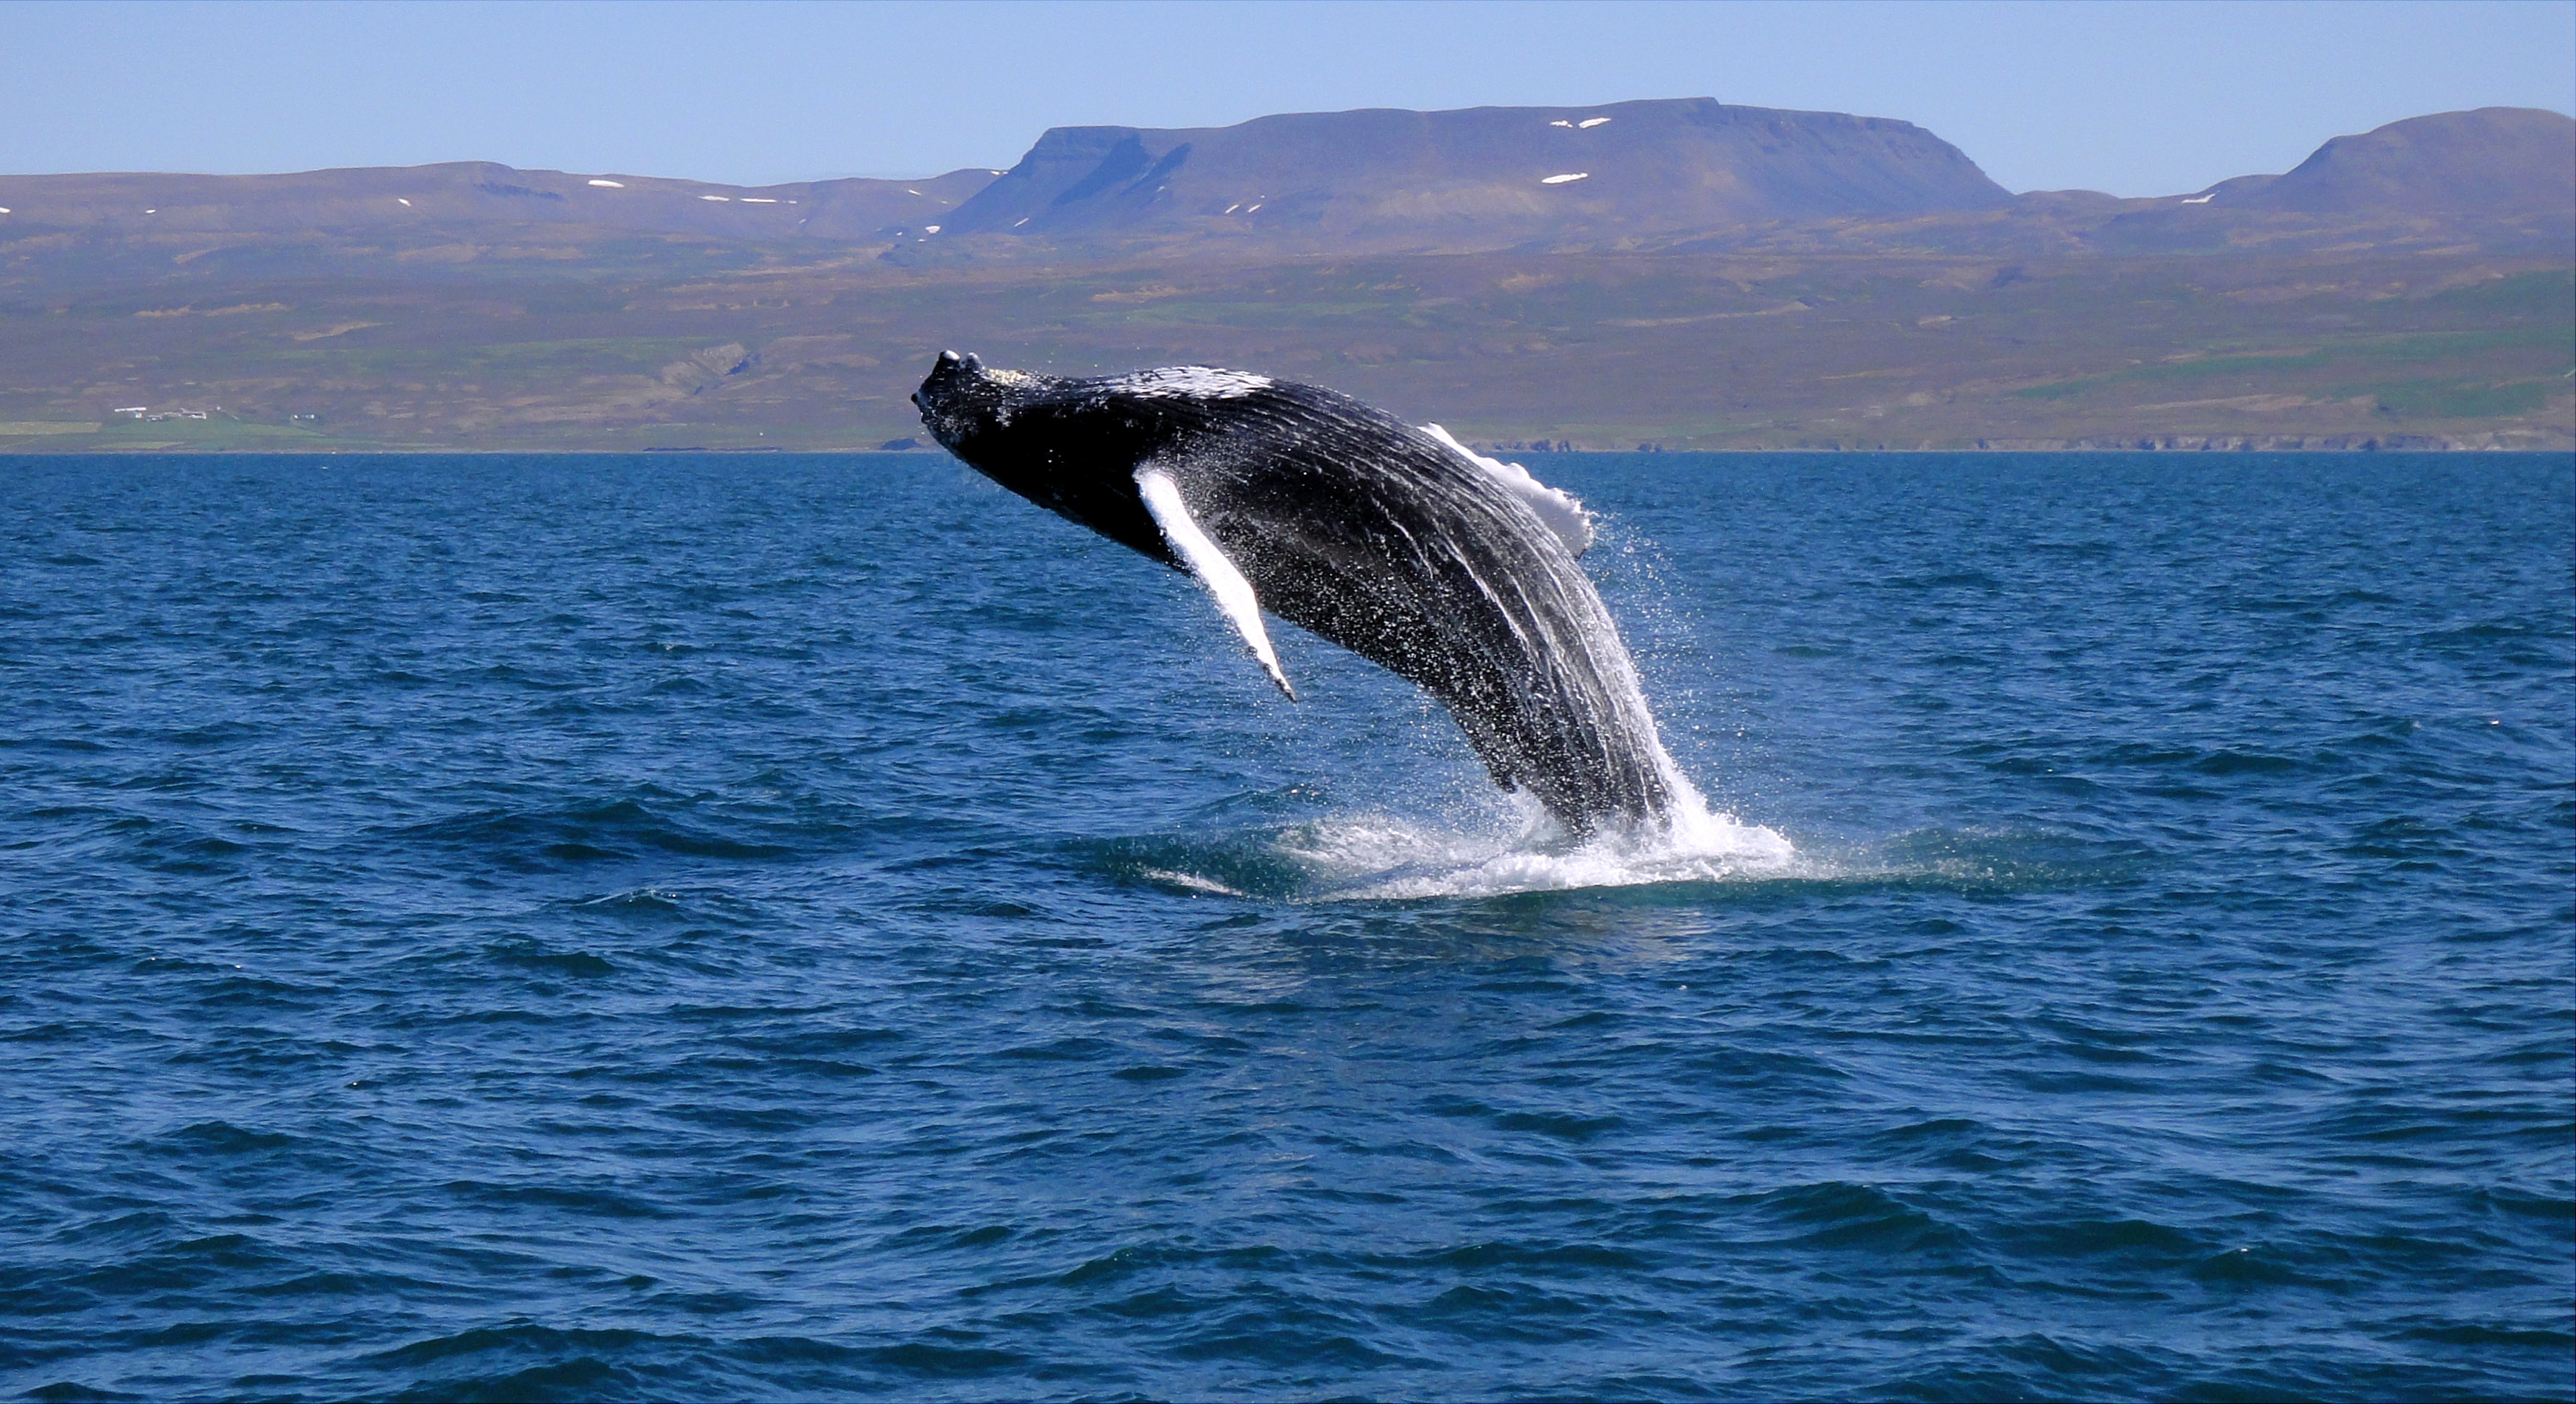 Whales regurarly breach the coastal waters around Iceland, creating stunning visual displays.